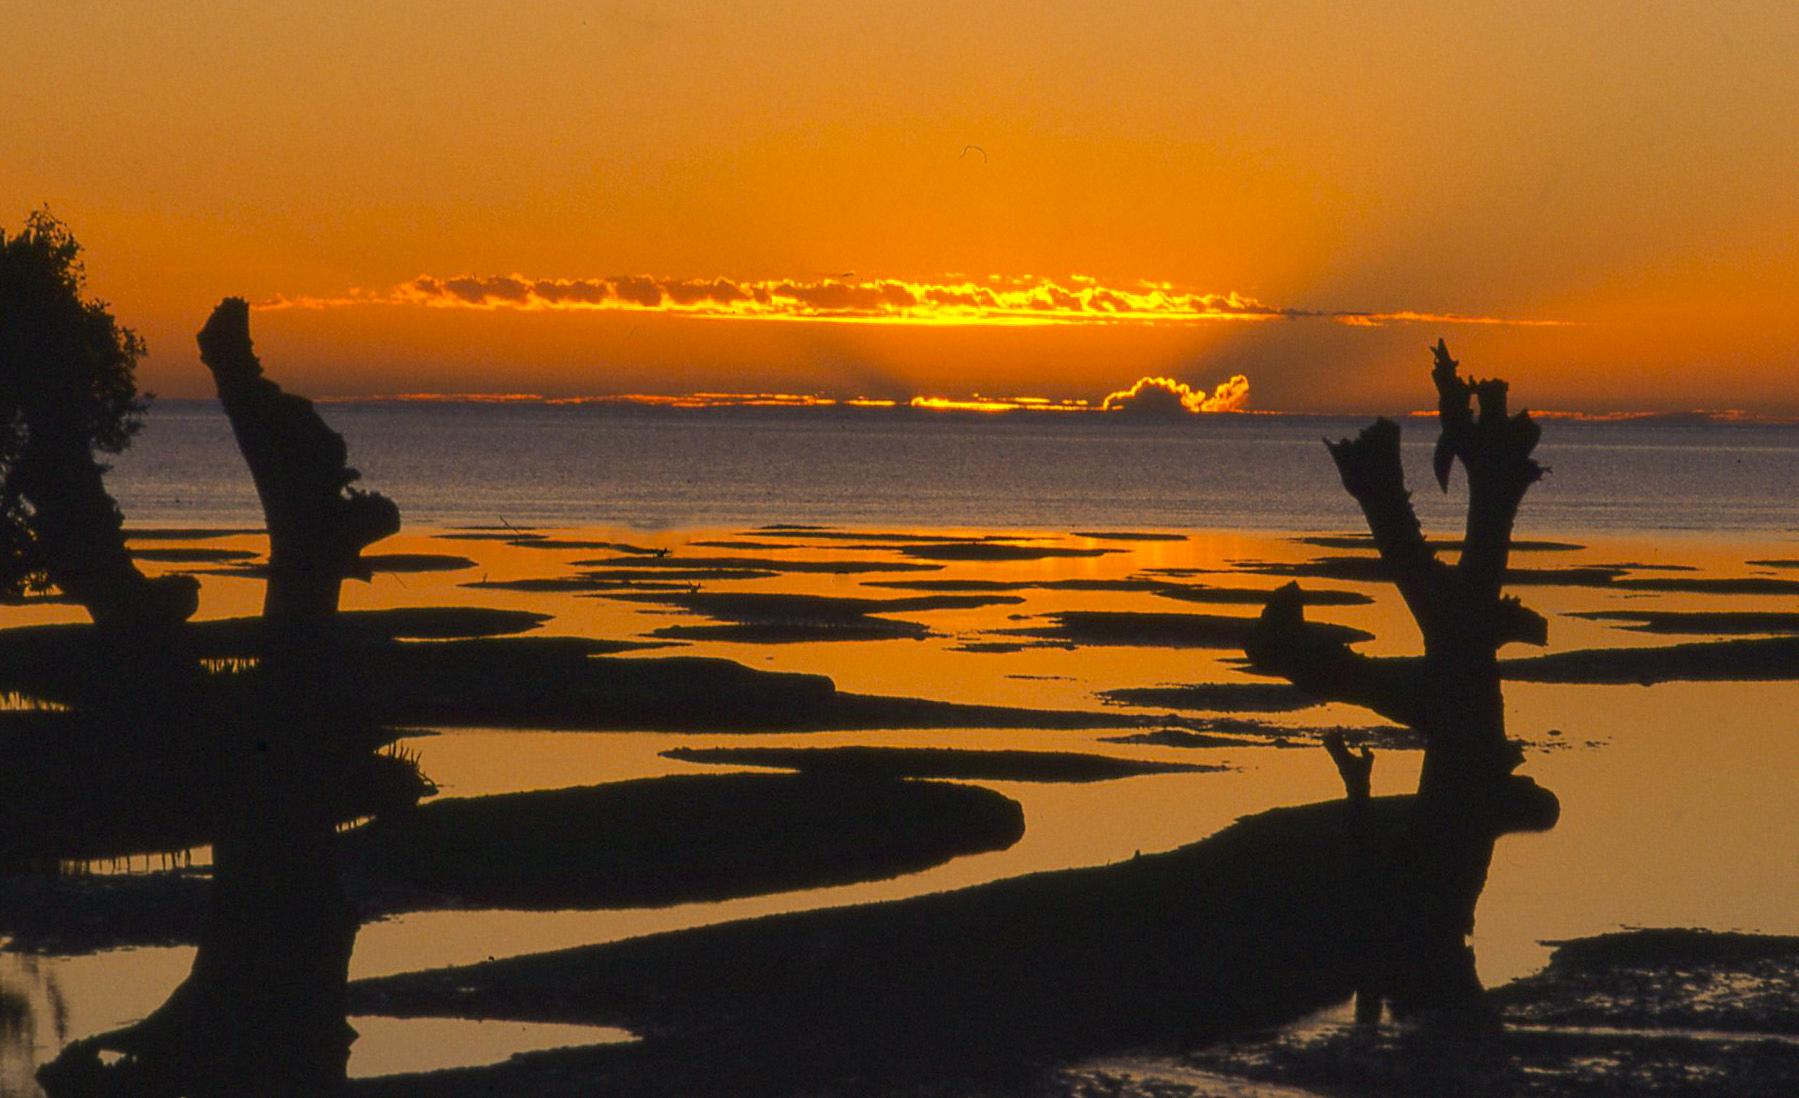 Sunset over the sea - Magagascar...